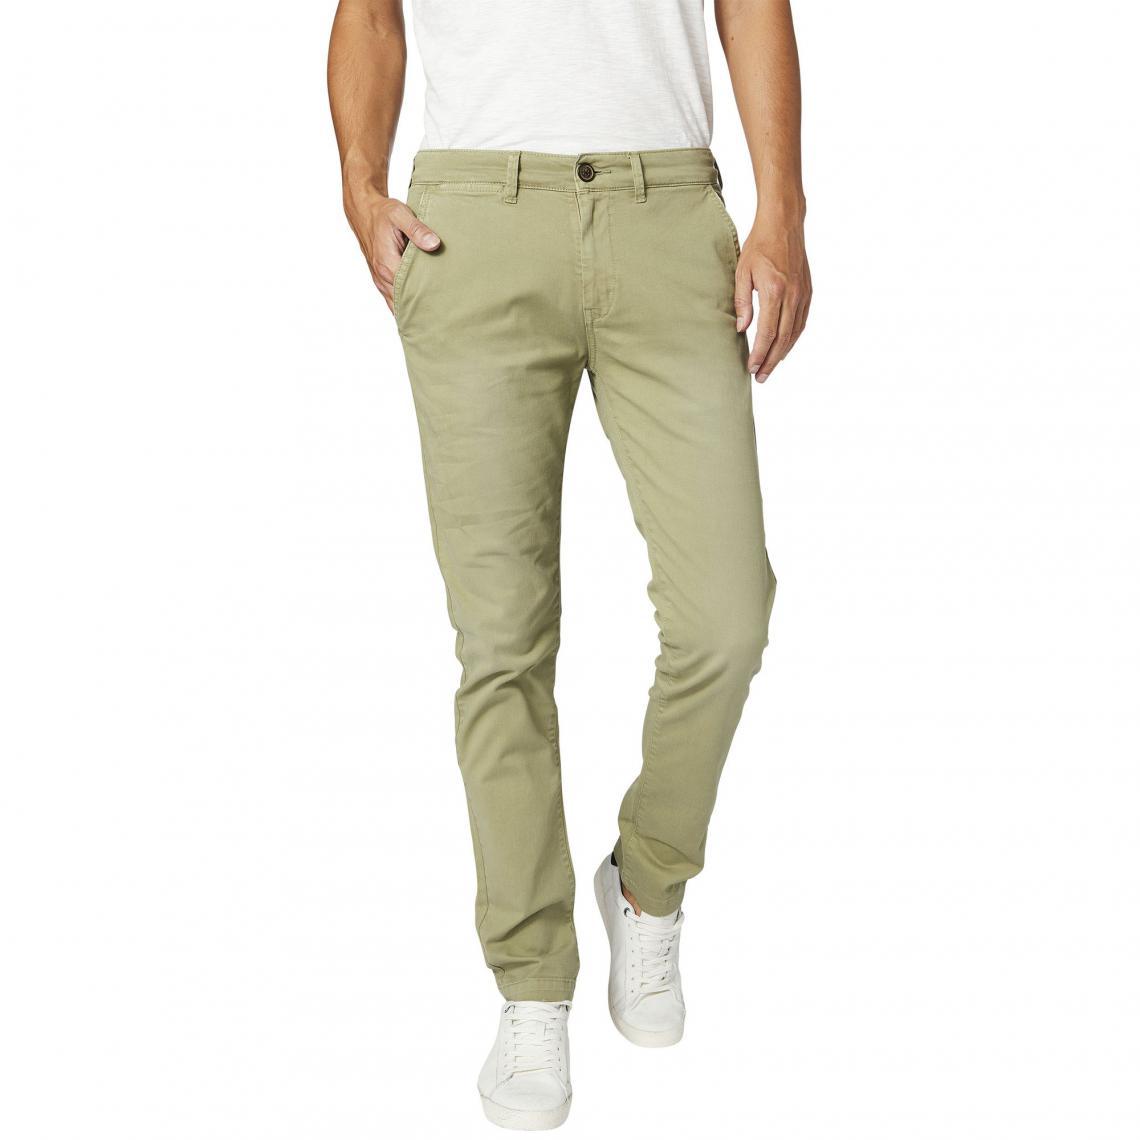 Pantalon chino L32 homme Sloane Pepe Jeans